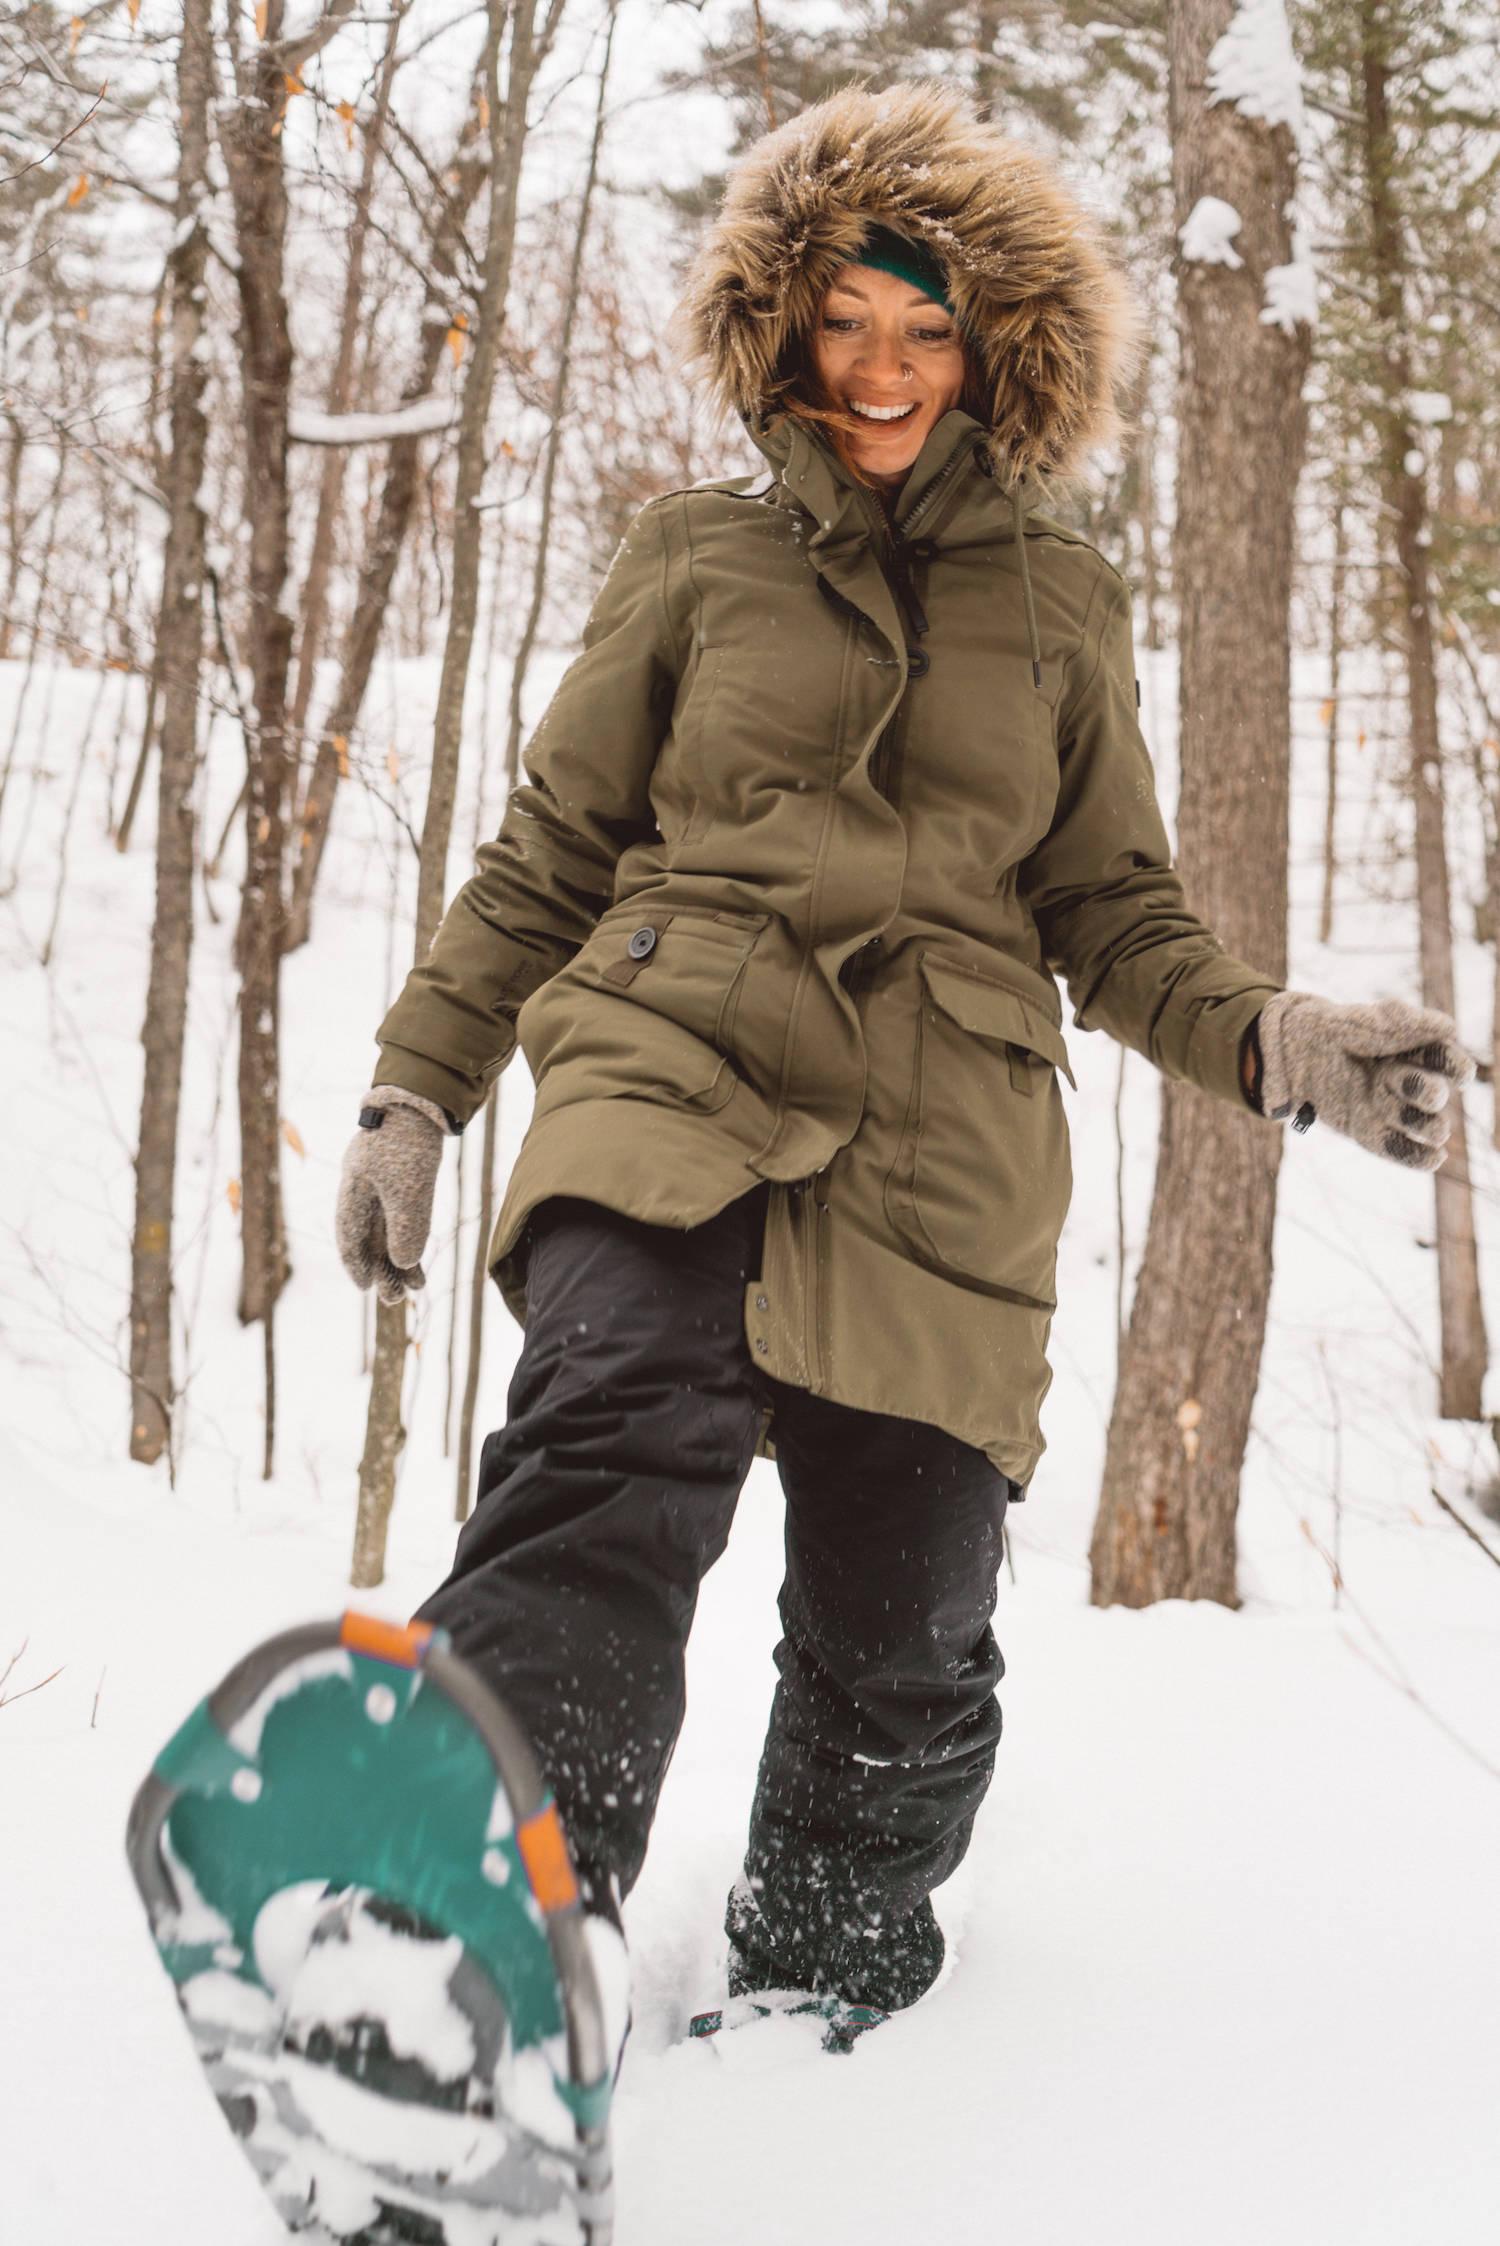 Snow shoeing in Ontario Canada